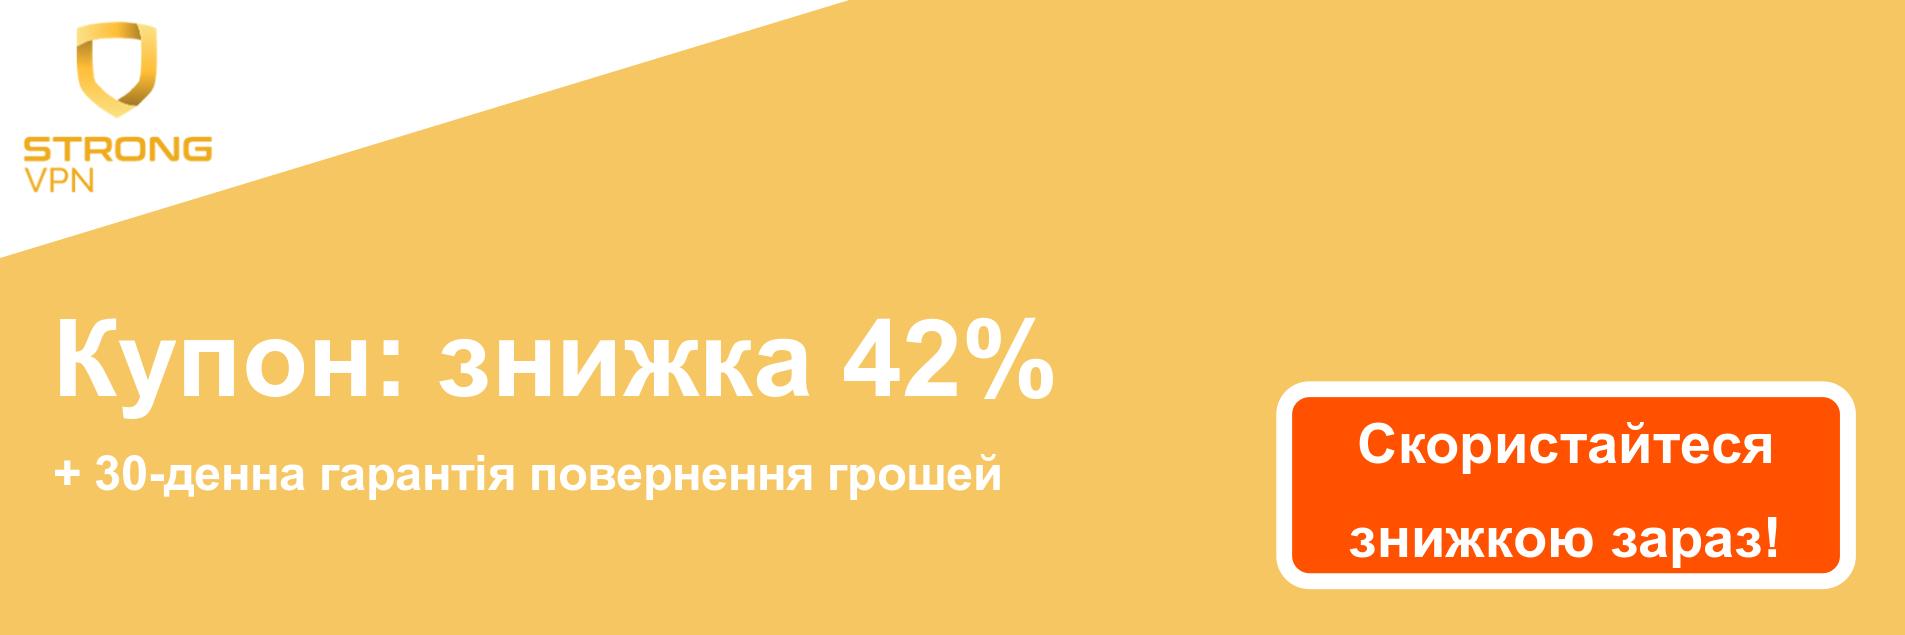 StrongVPN купона банер - 42% знижка